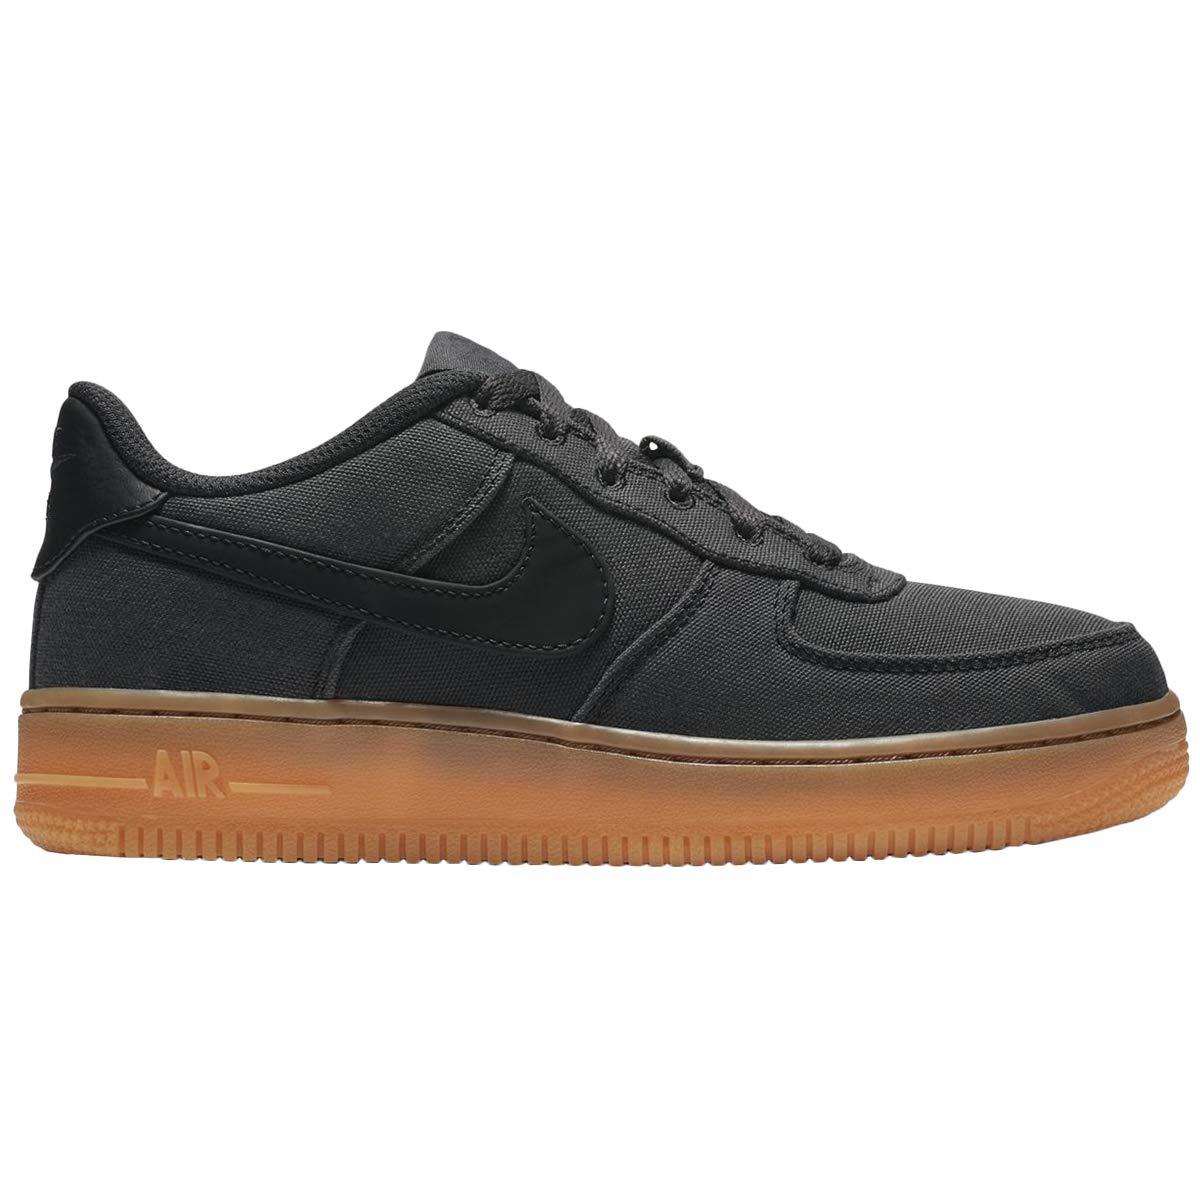 MultiCouleure (noir noir Gum Med marron noir 001) Nike Air Force 1 Lv8 Style (GS), Chaussures de Fitness garçon 38 EU